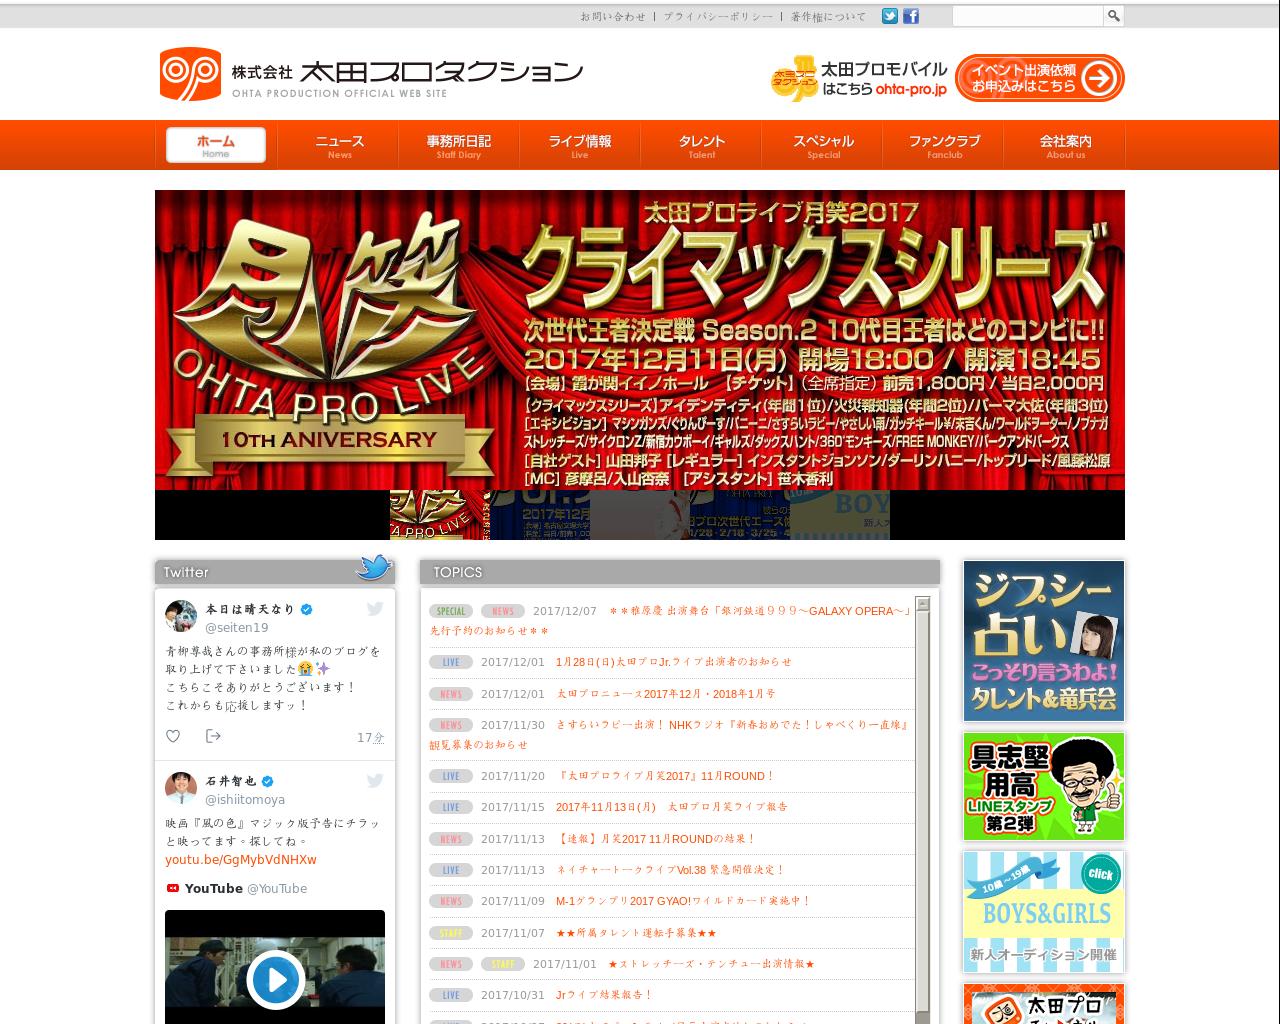 www.ohtapro.co.jp(2017/12/07 03:40:31)